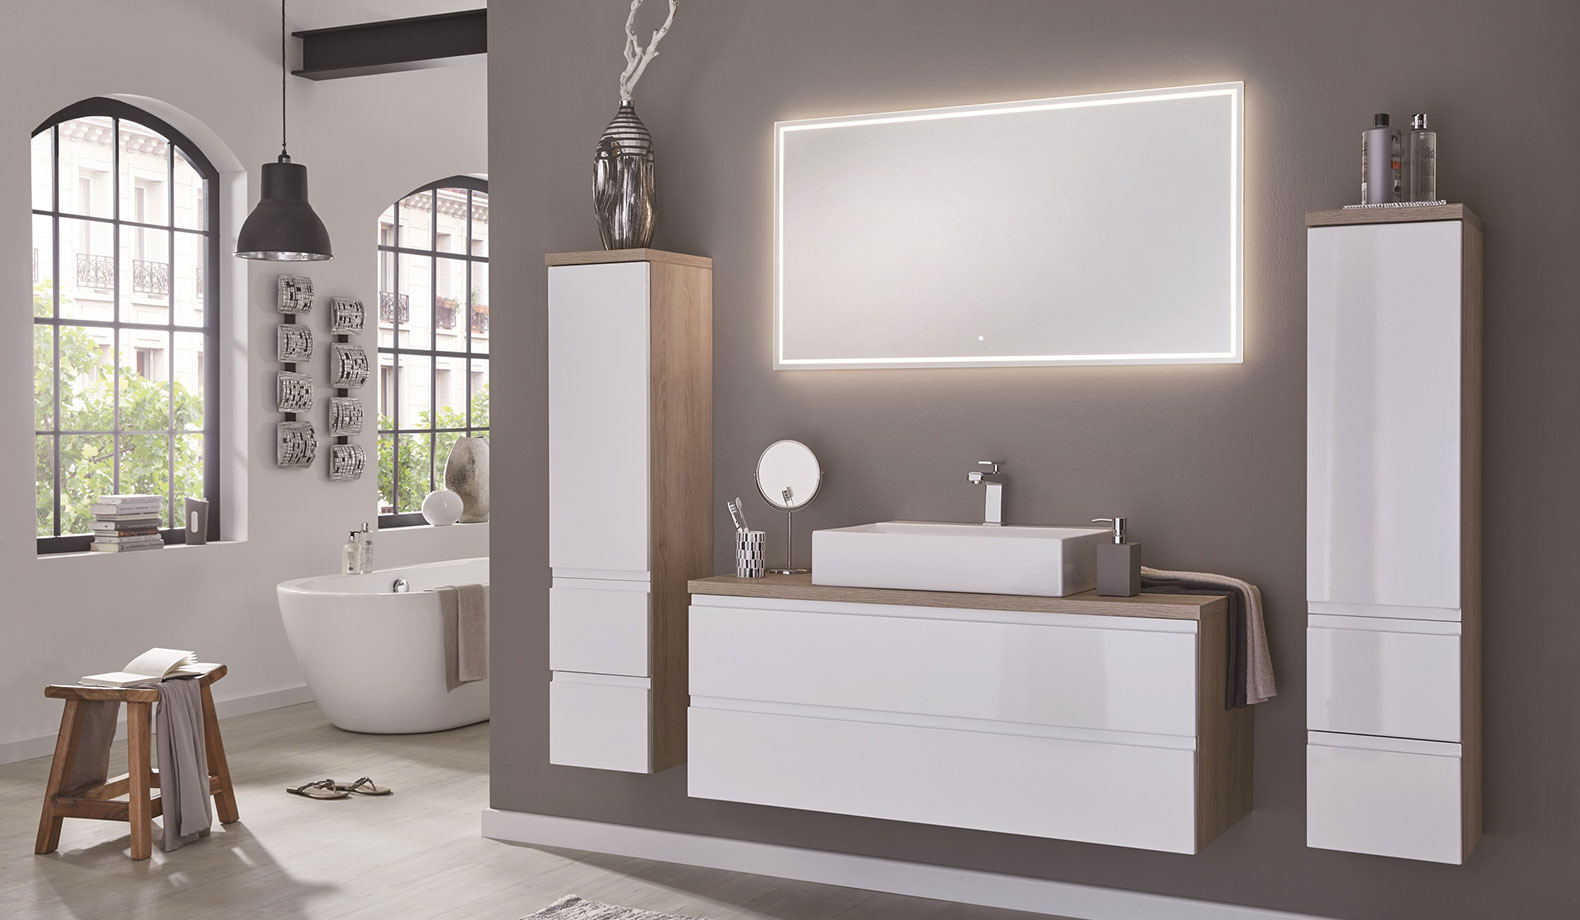 projekte objekte bad adler m bel kreative einrichtungswerkstatt. Black Bedroom Furniture Sets. Home Design Ideas